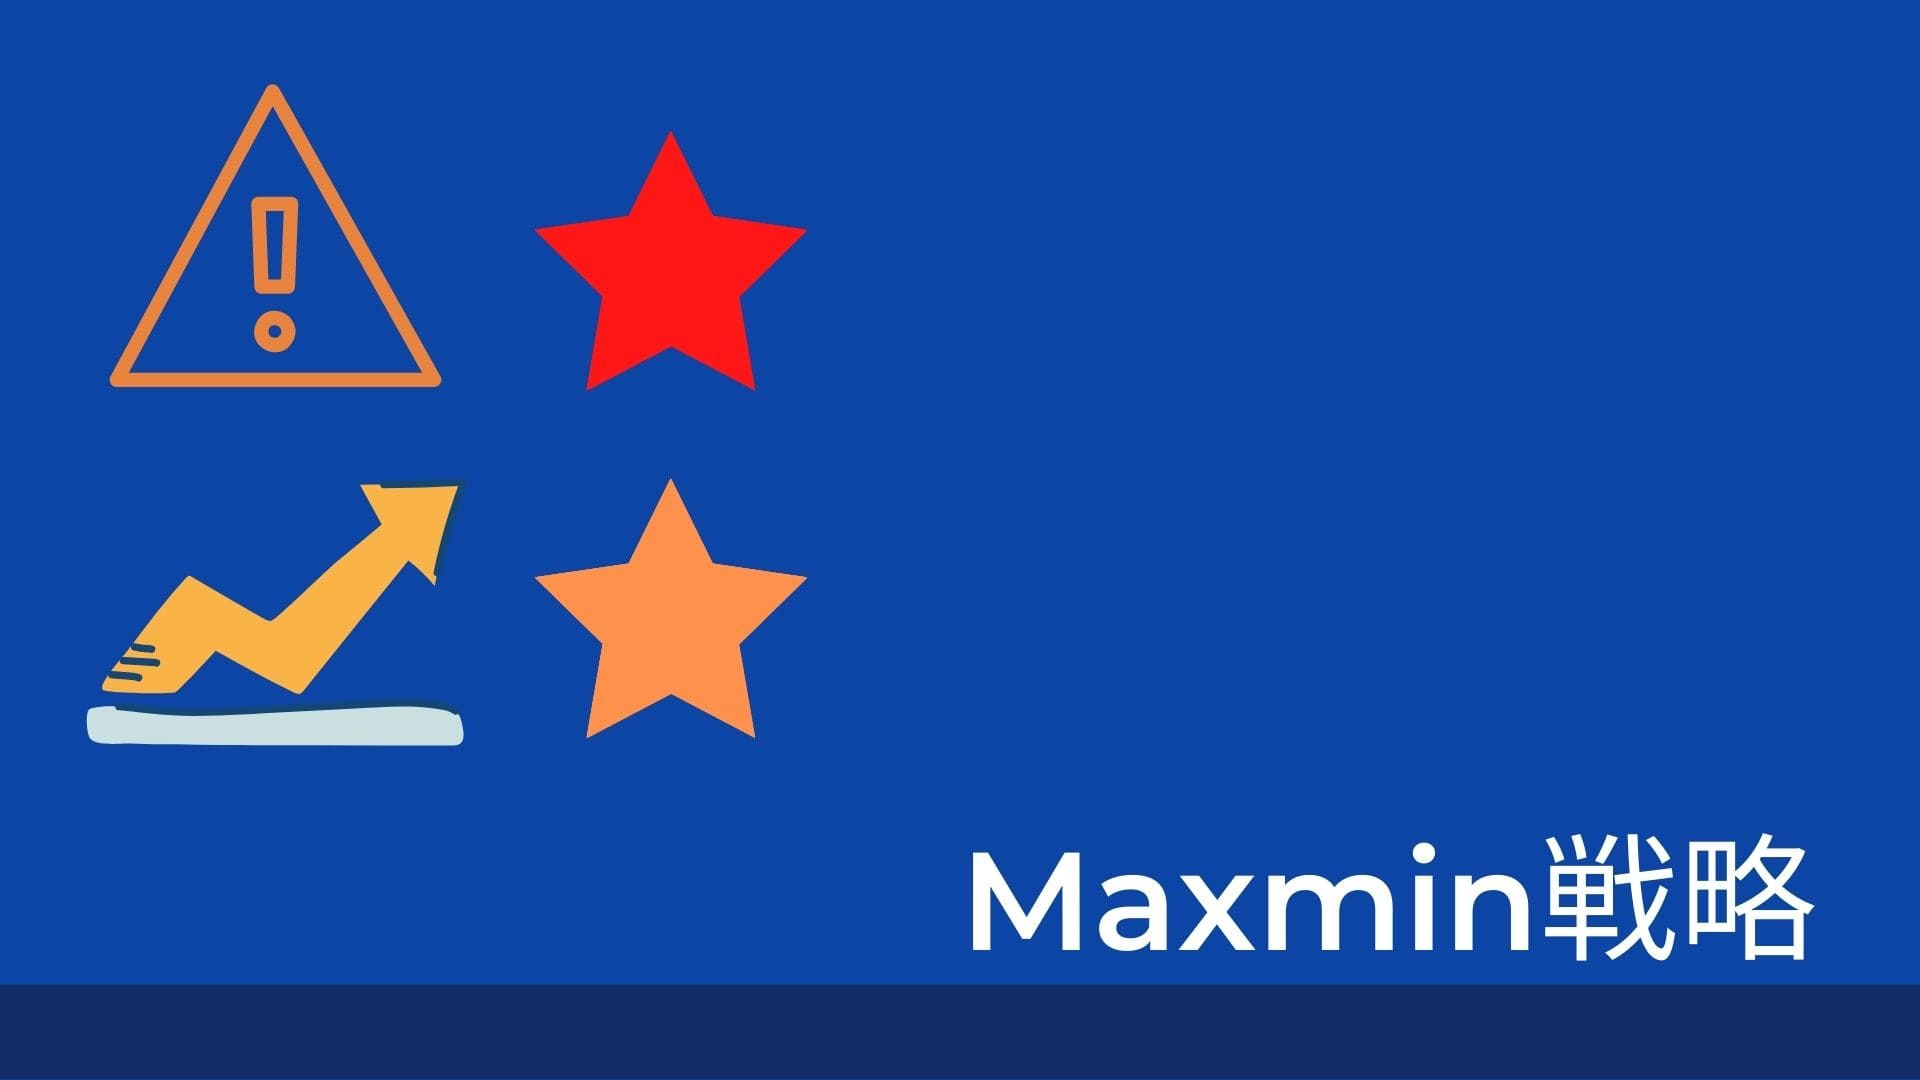 Maxmin[マクミン]戦略